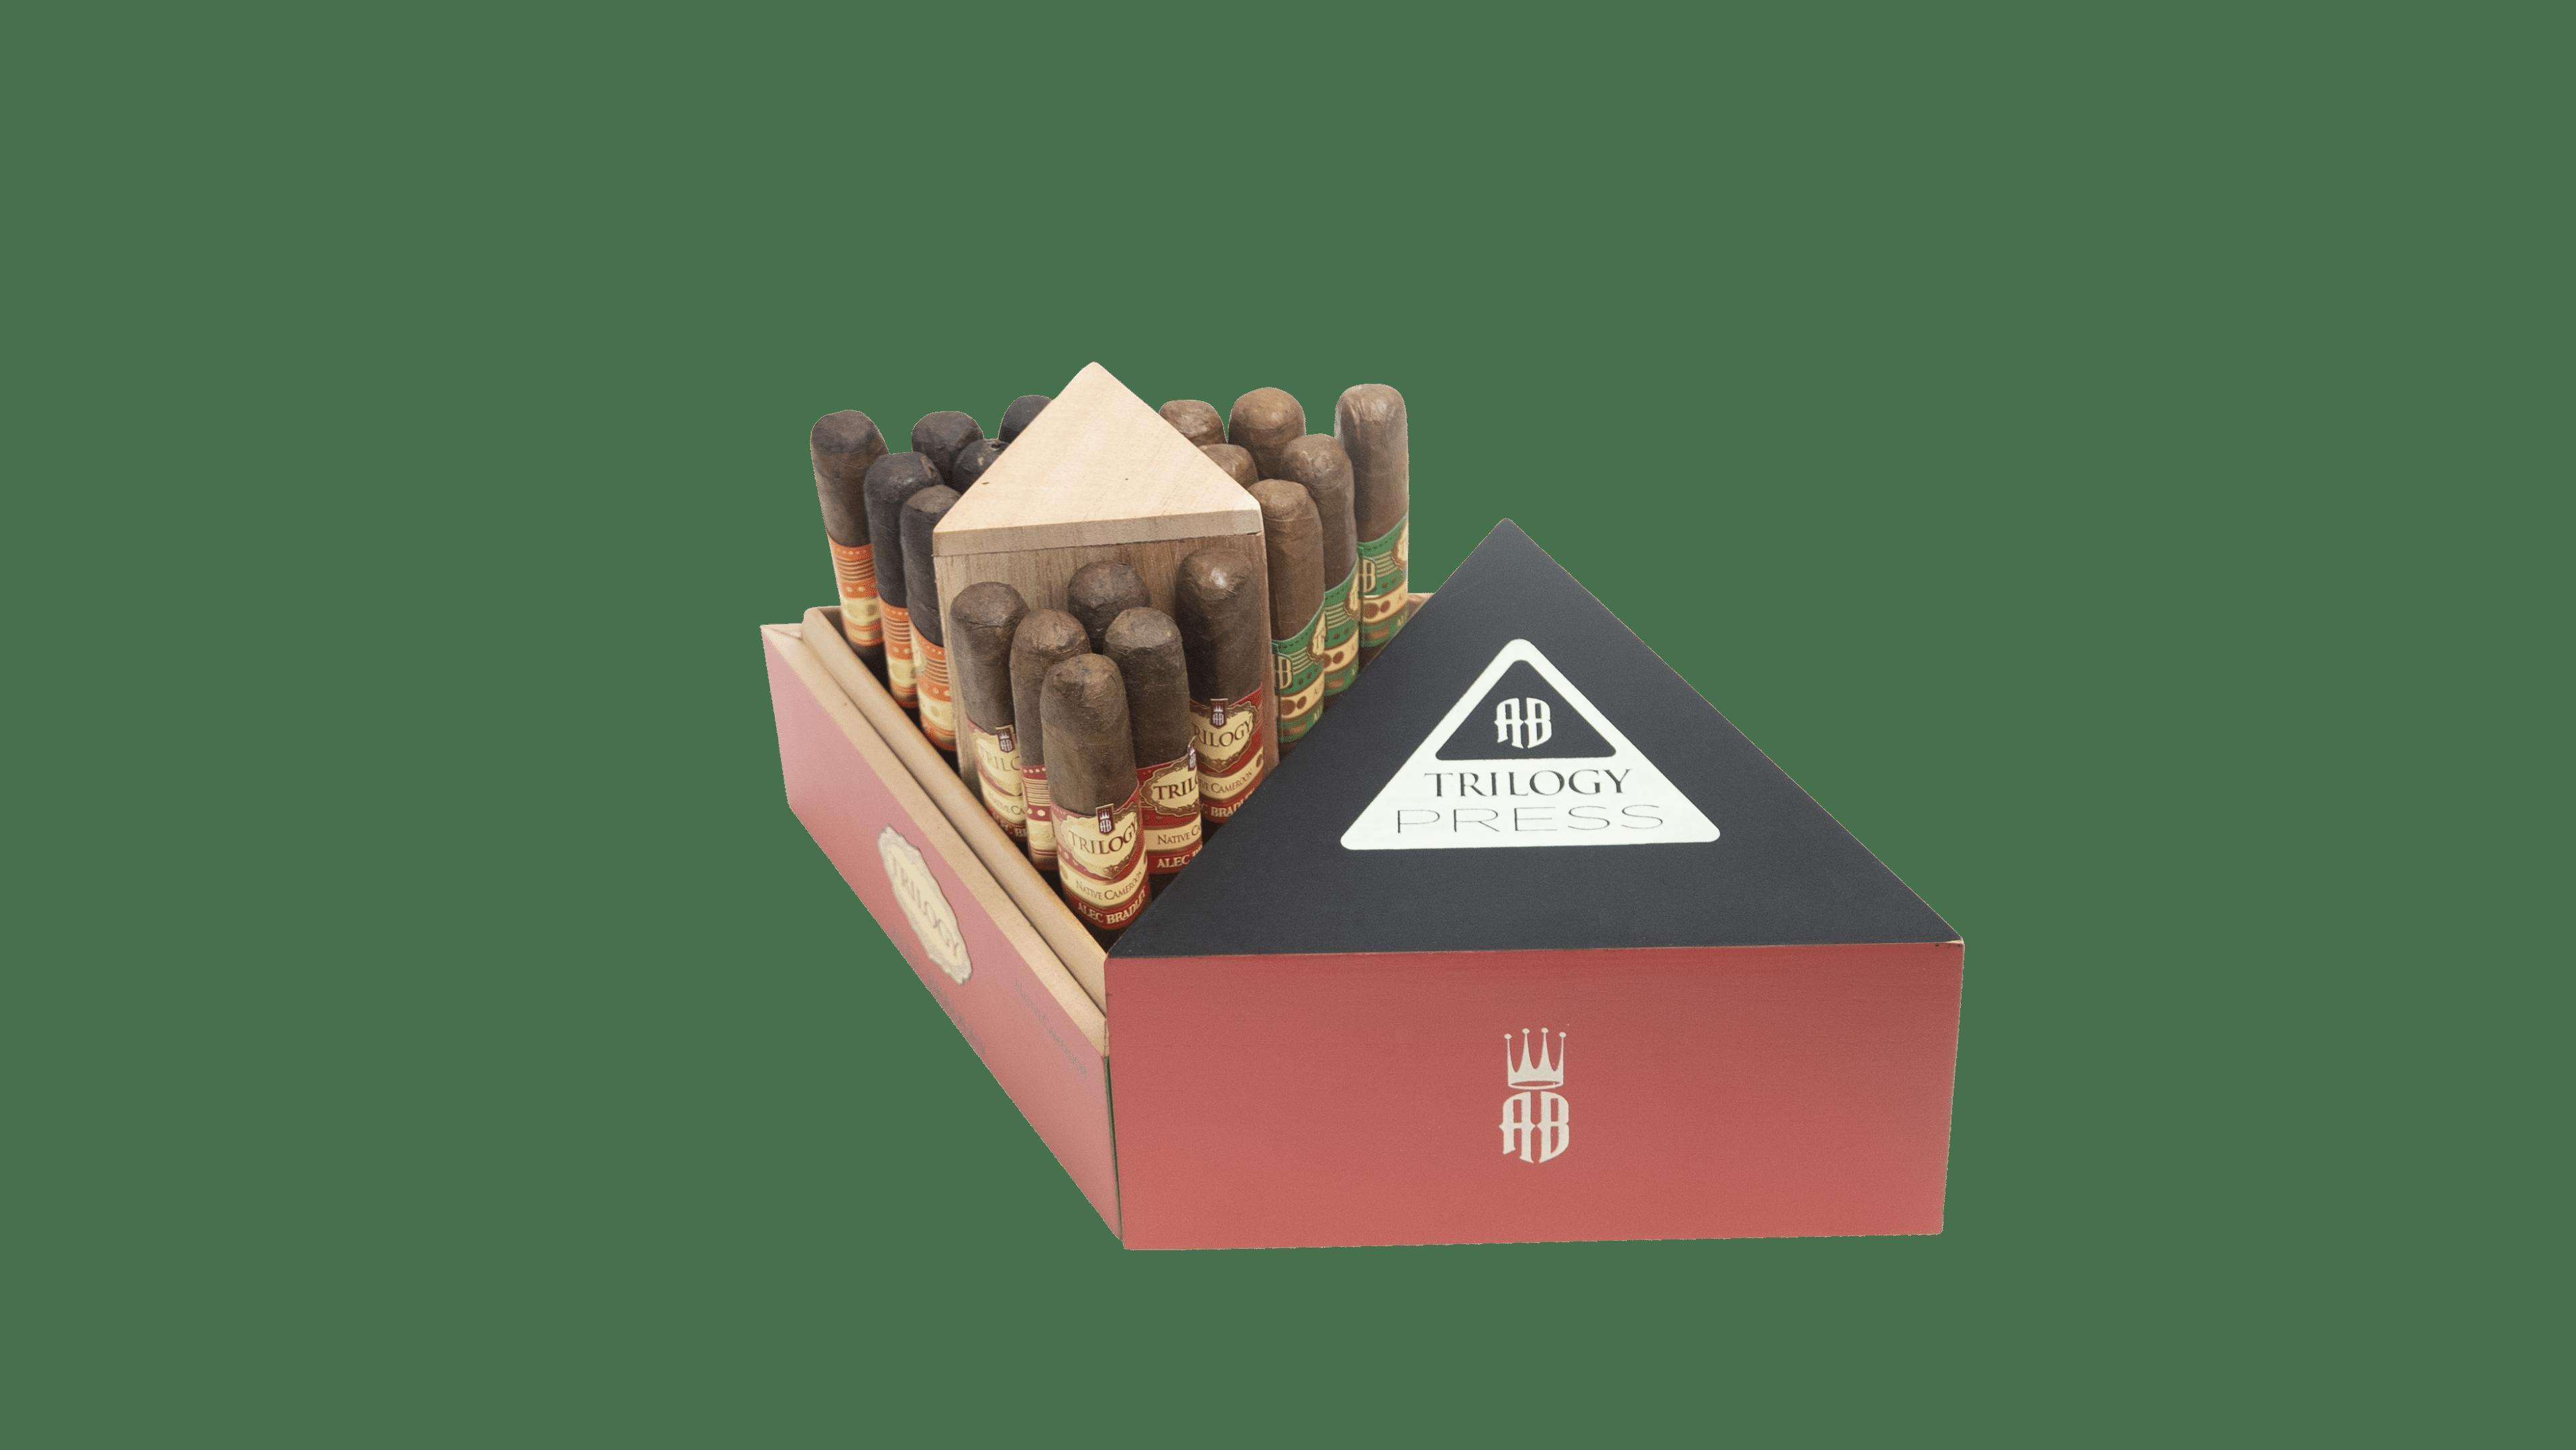 Alec Bradley Brings Back Trilogy Cigars - Cigar News